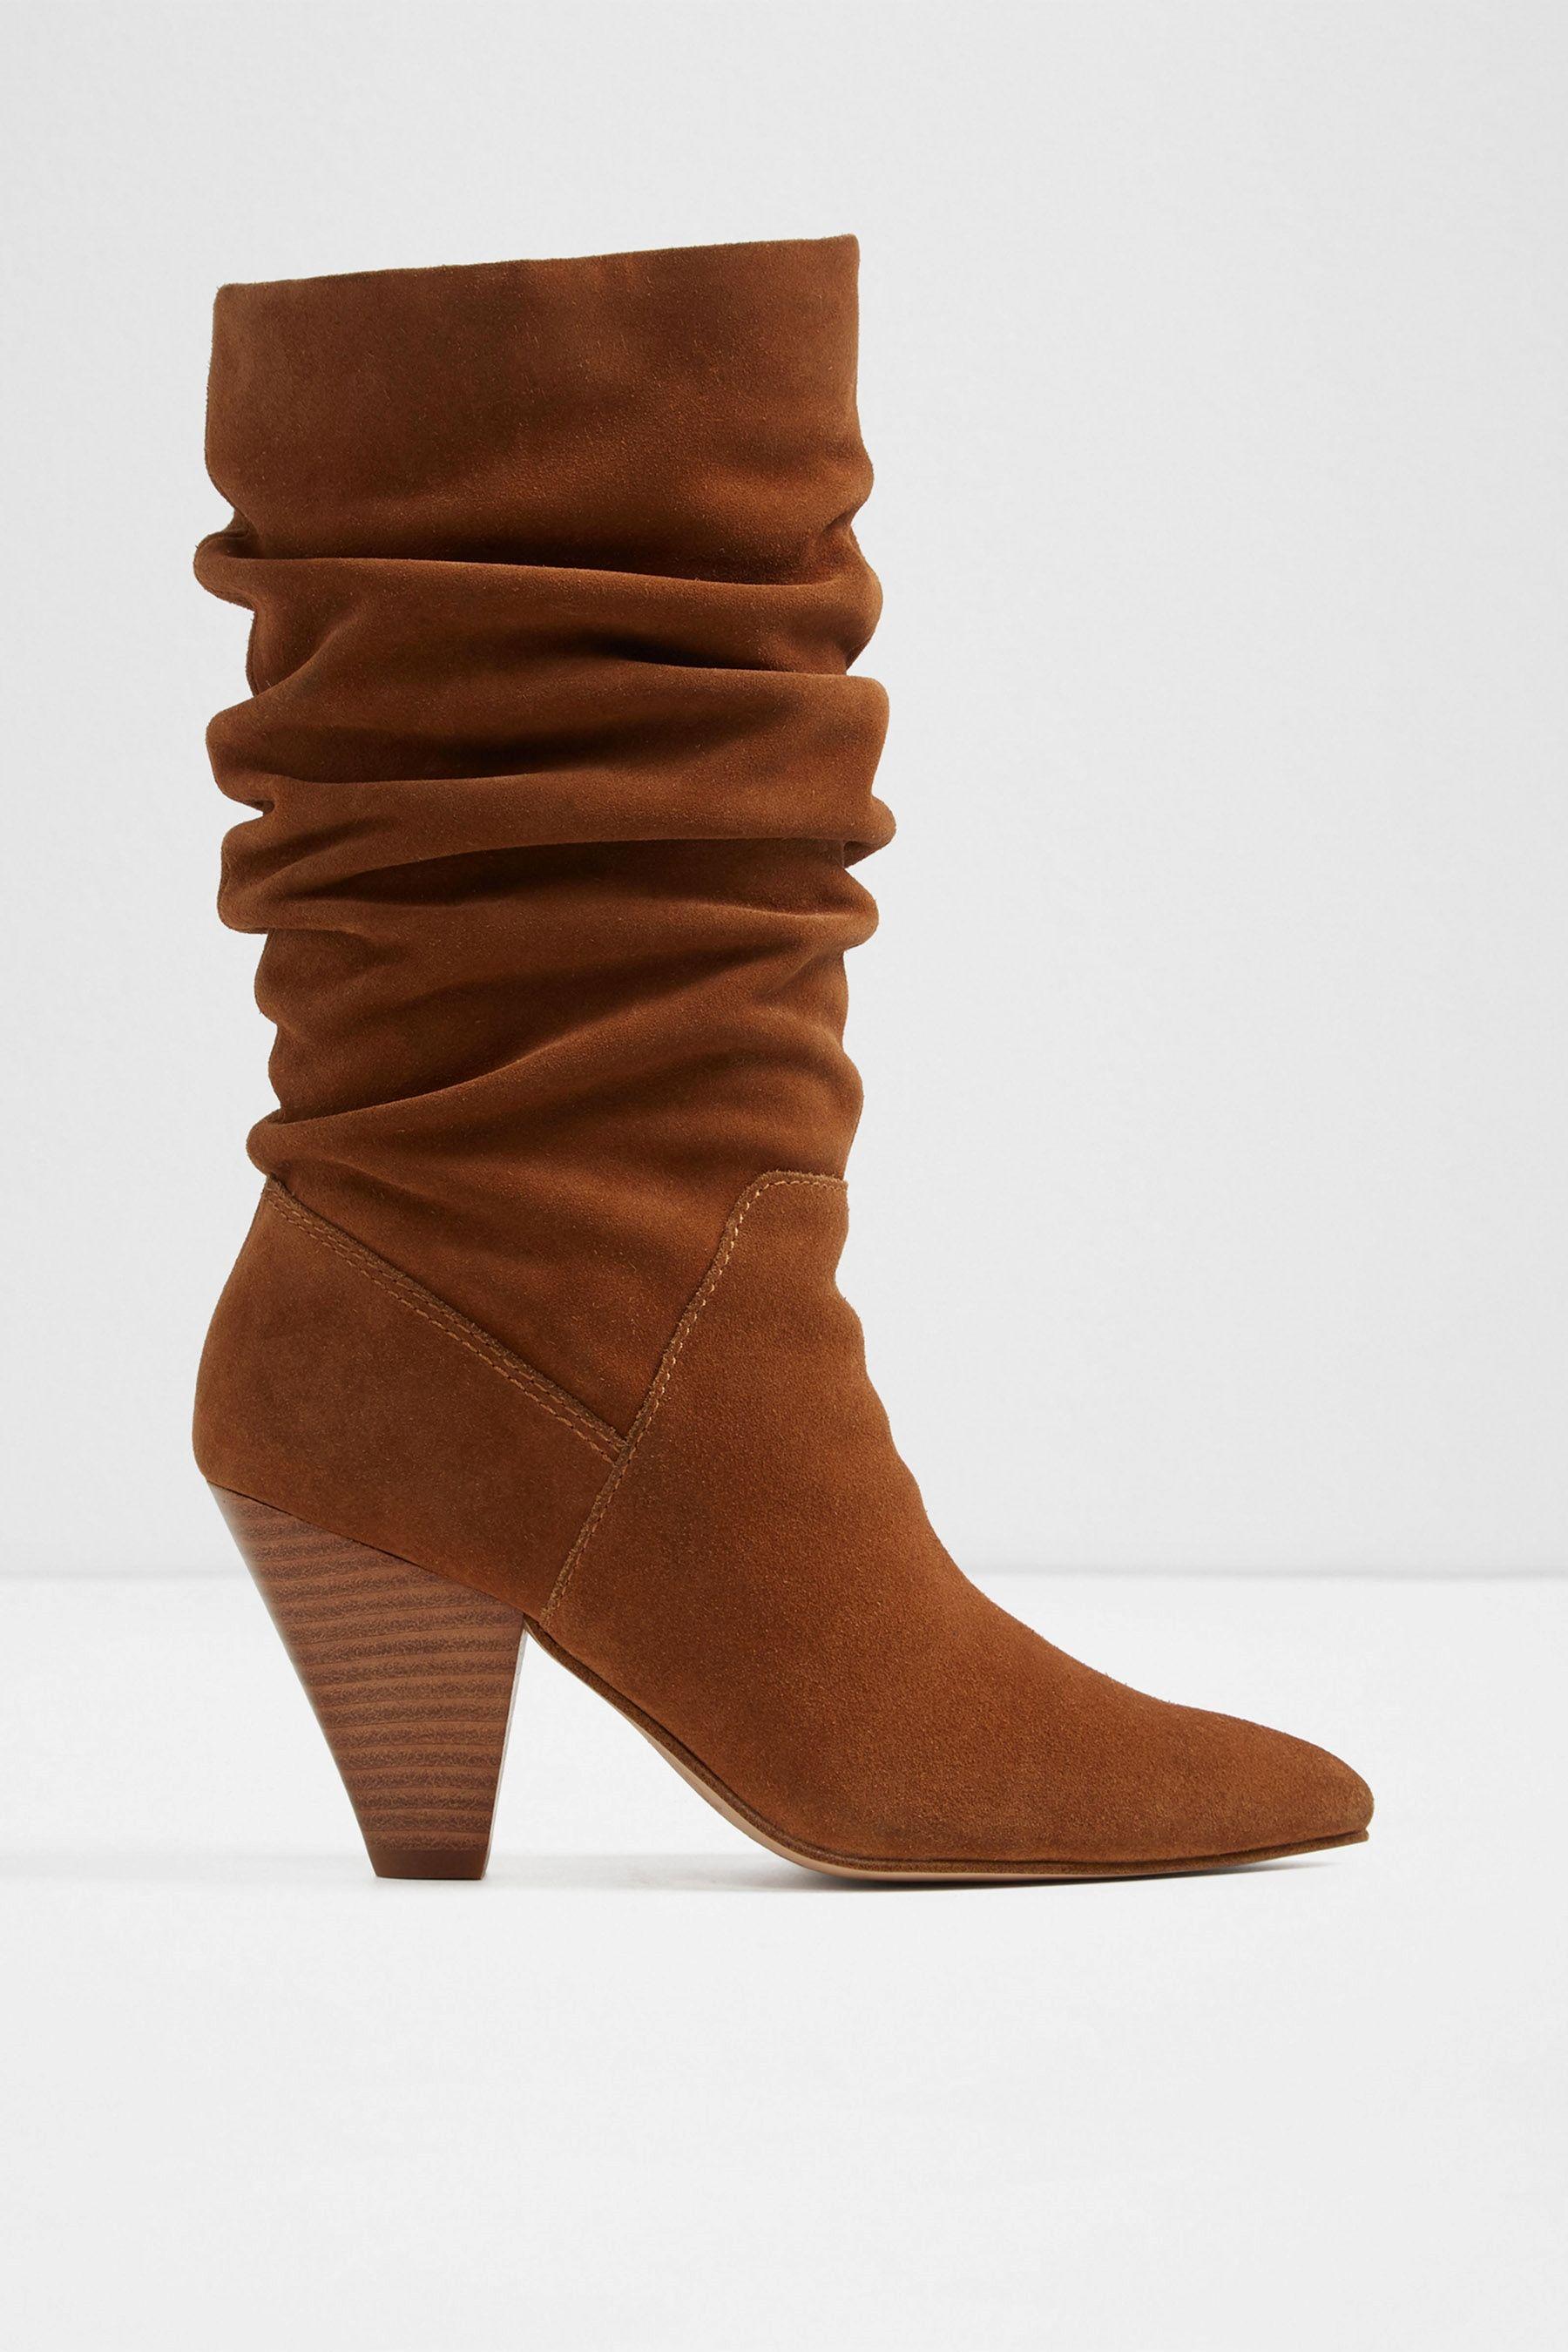 26f0fafc3da Womens Aldo Ladies Cone Heel Slouch Calf Leather Boot - Brown ...